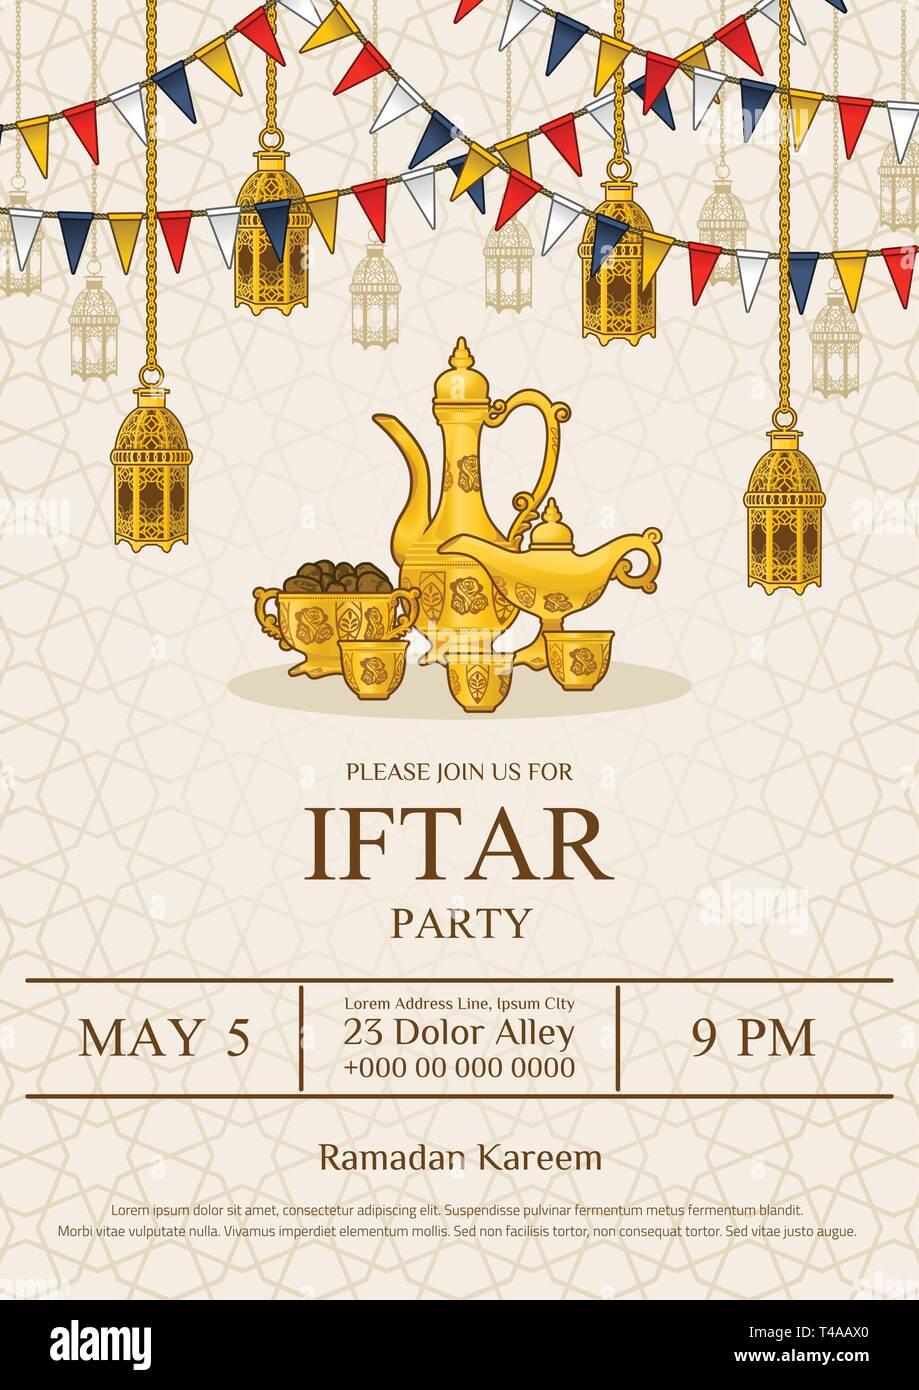 Islamic Iftar Party Invitation Flyer Card Design Oriental